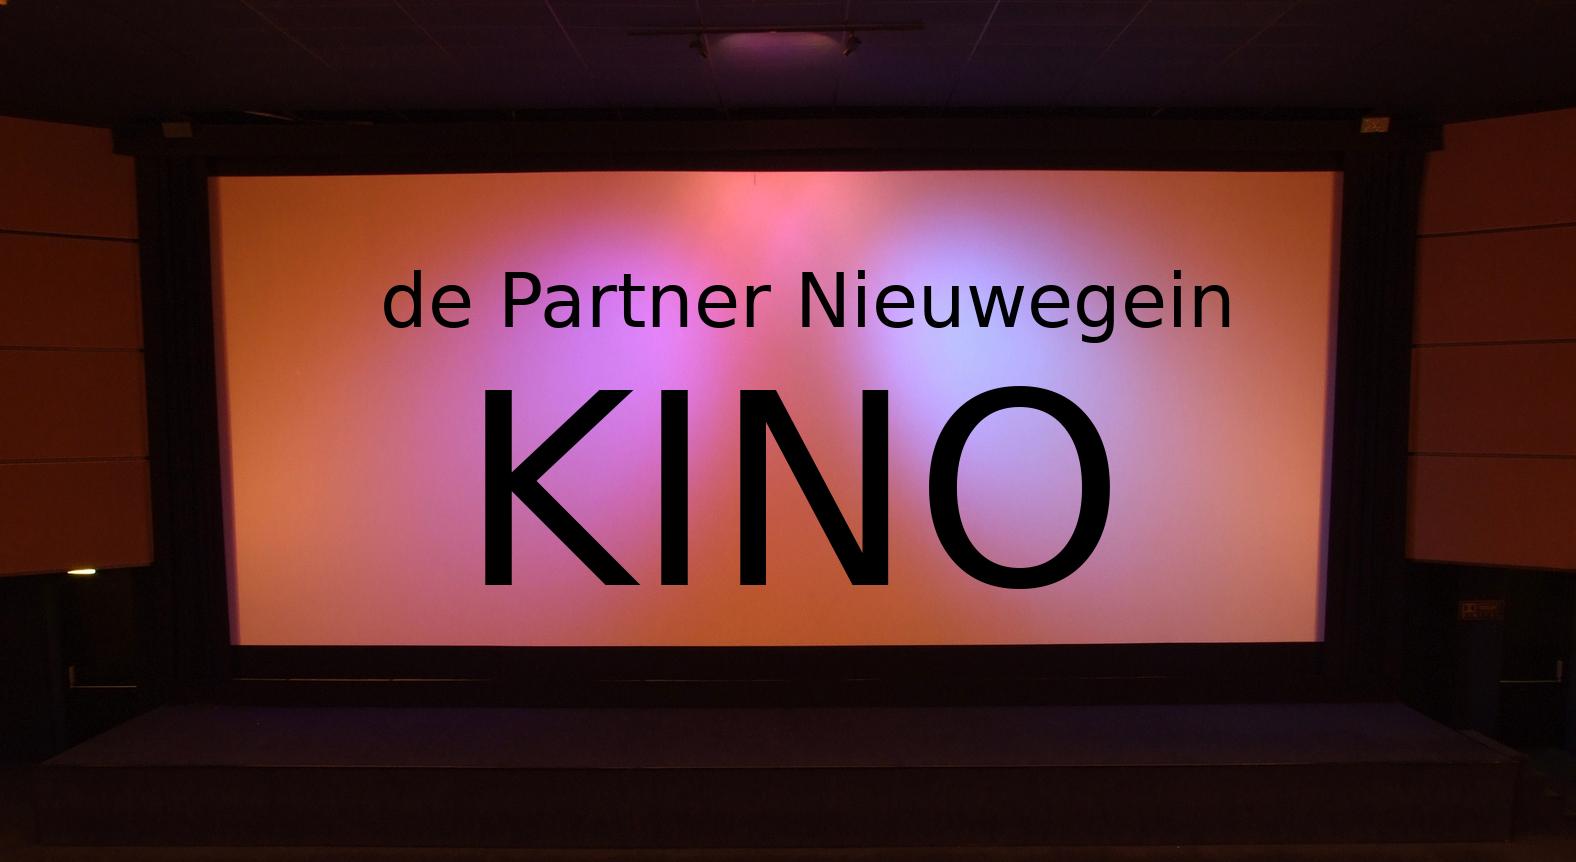 KINO Nieuwegein